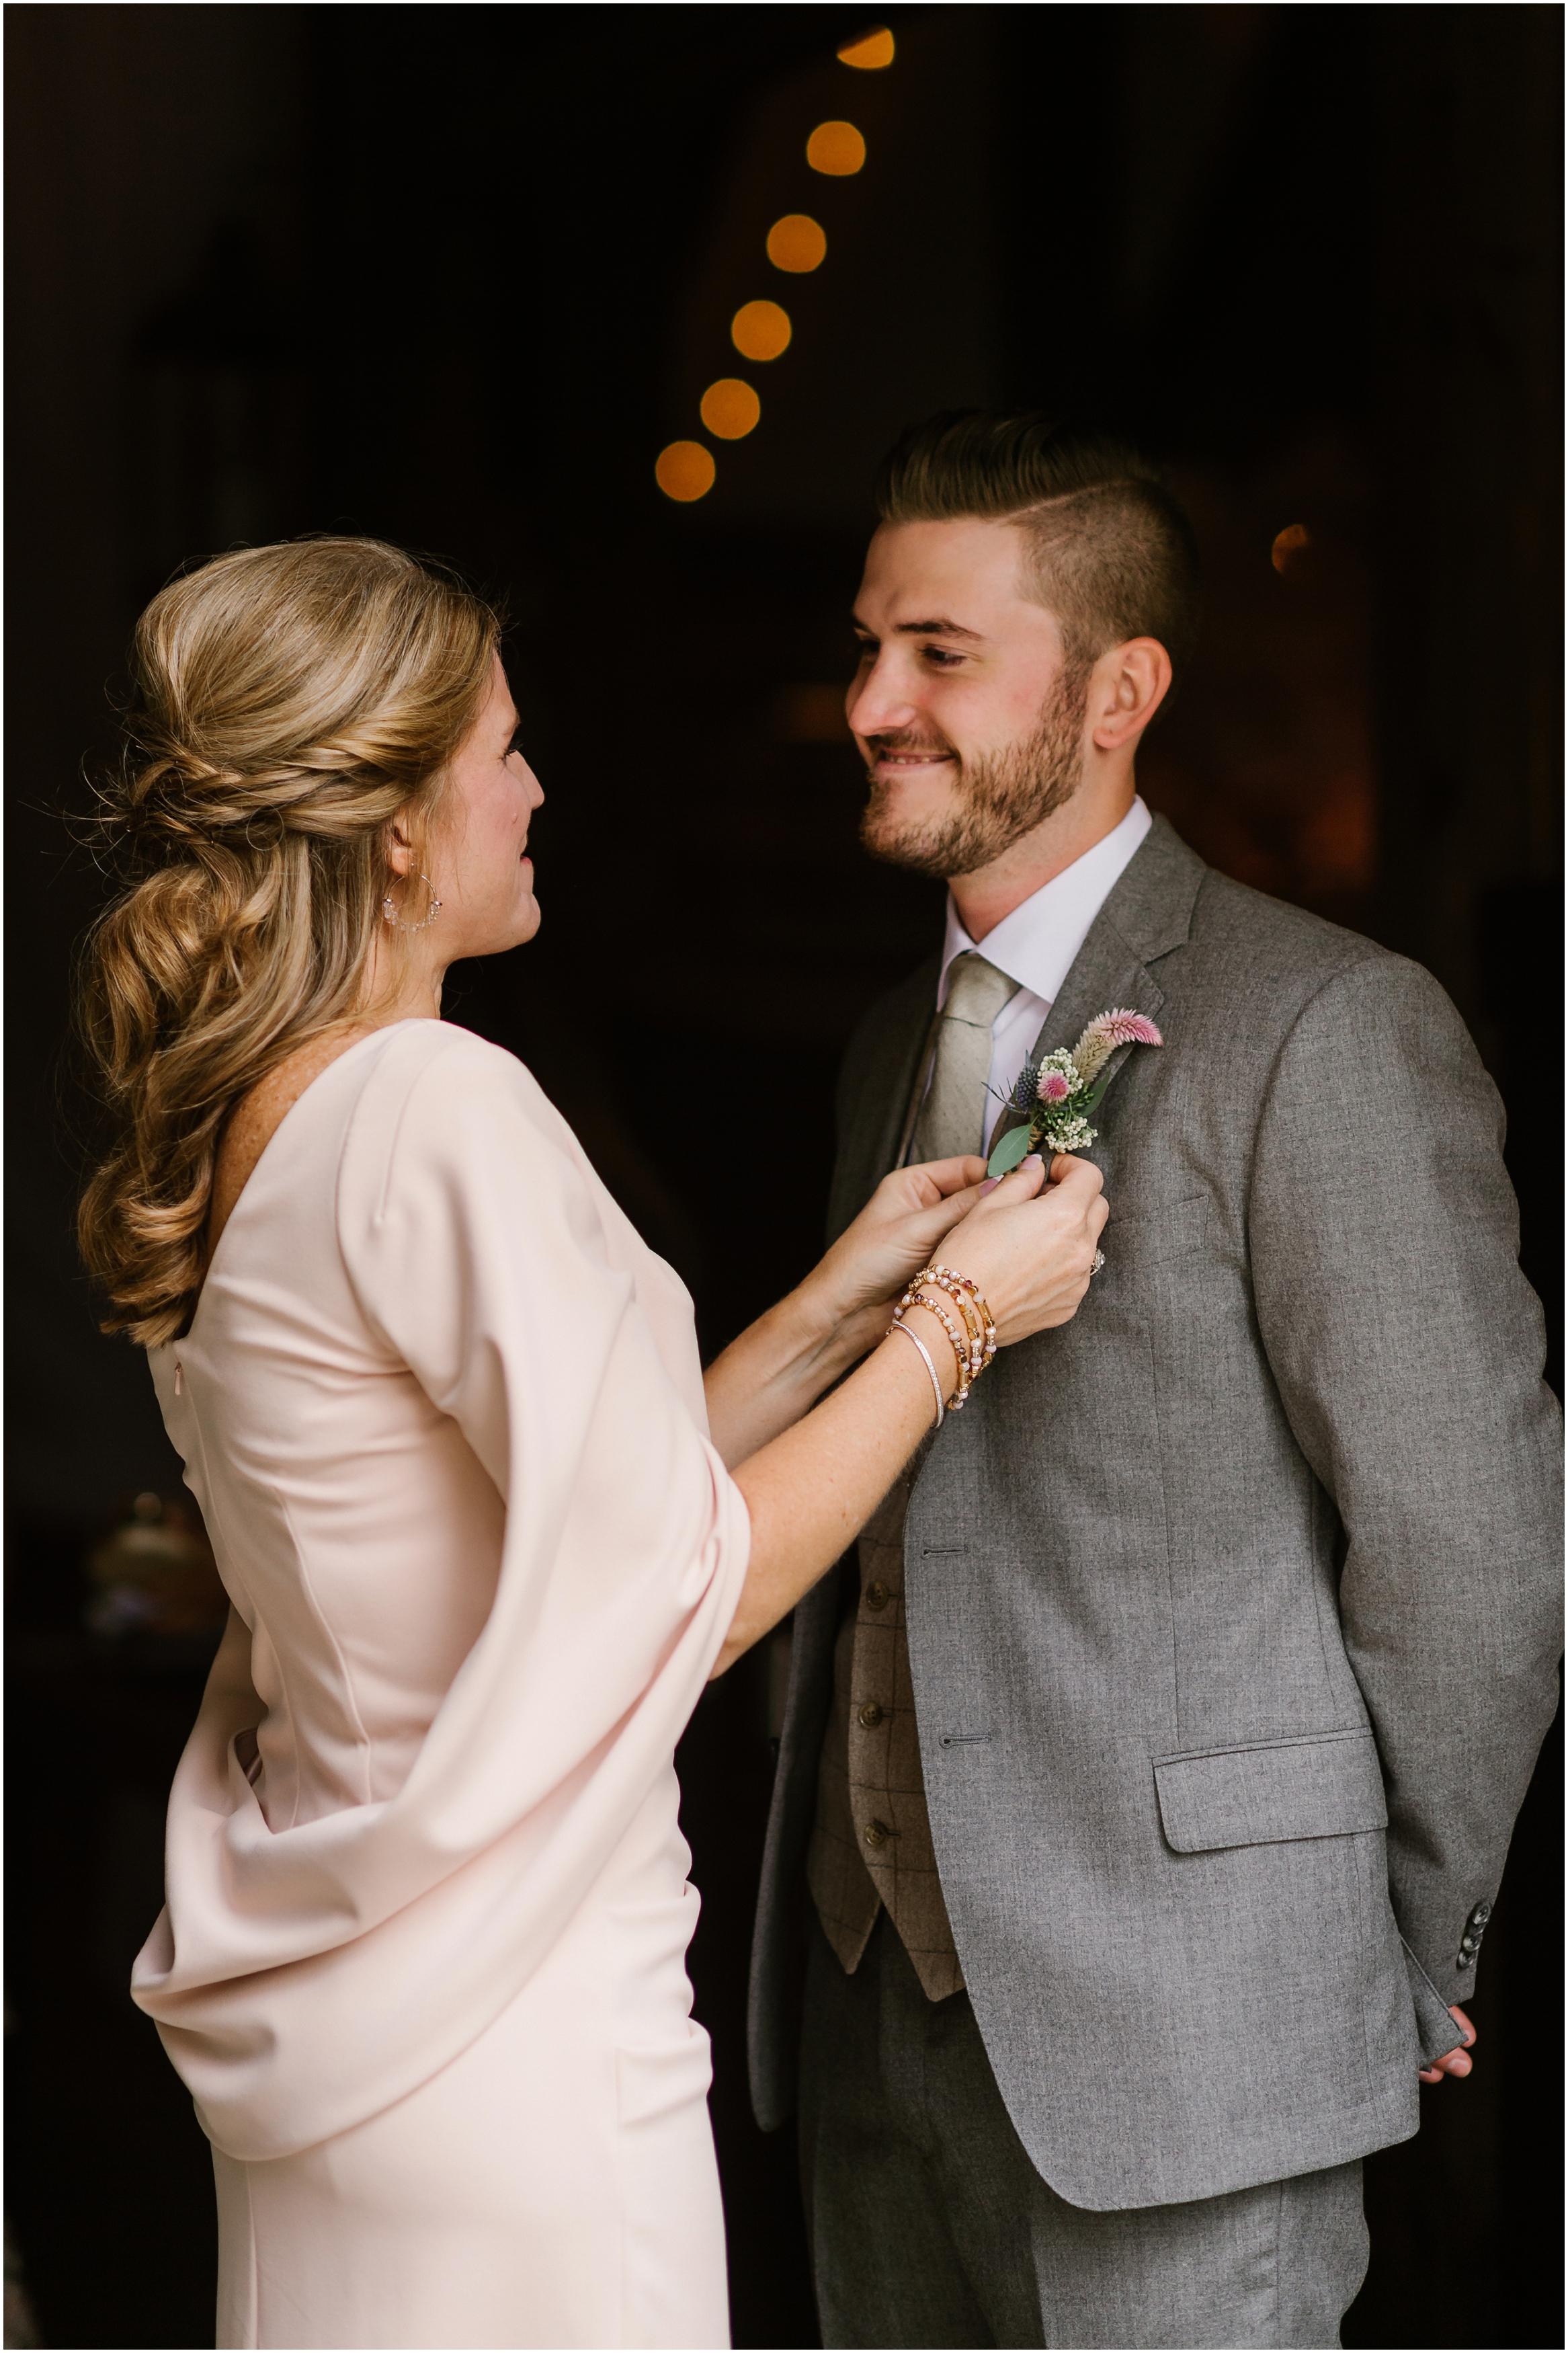 Rebecca_Shehorn_Photography_Indianapolis_Wedding_Photographer_9263.jpg